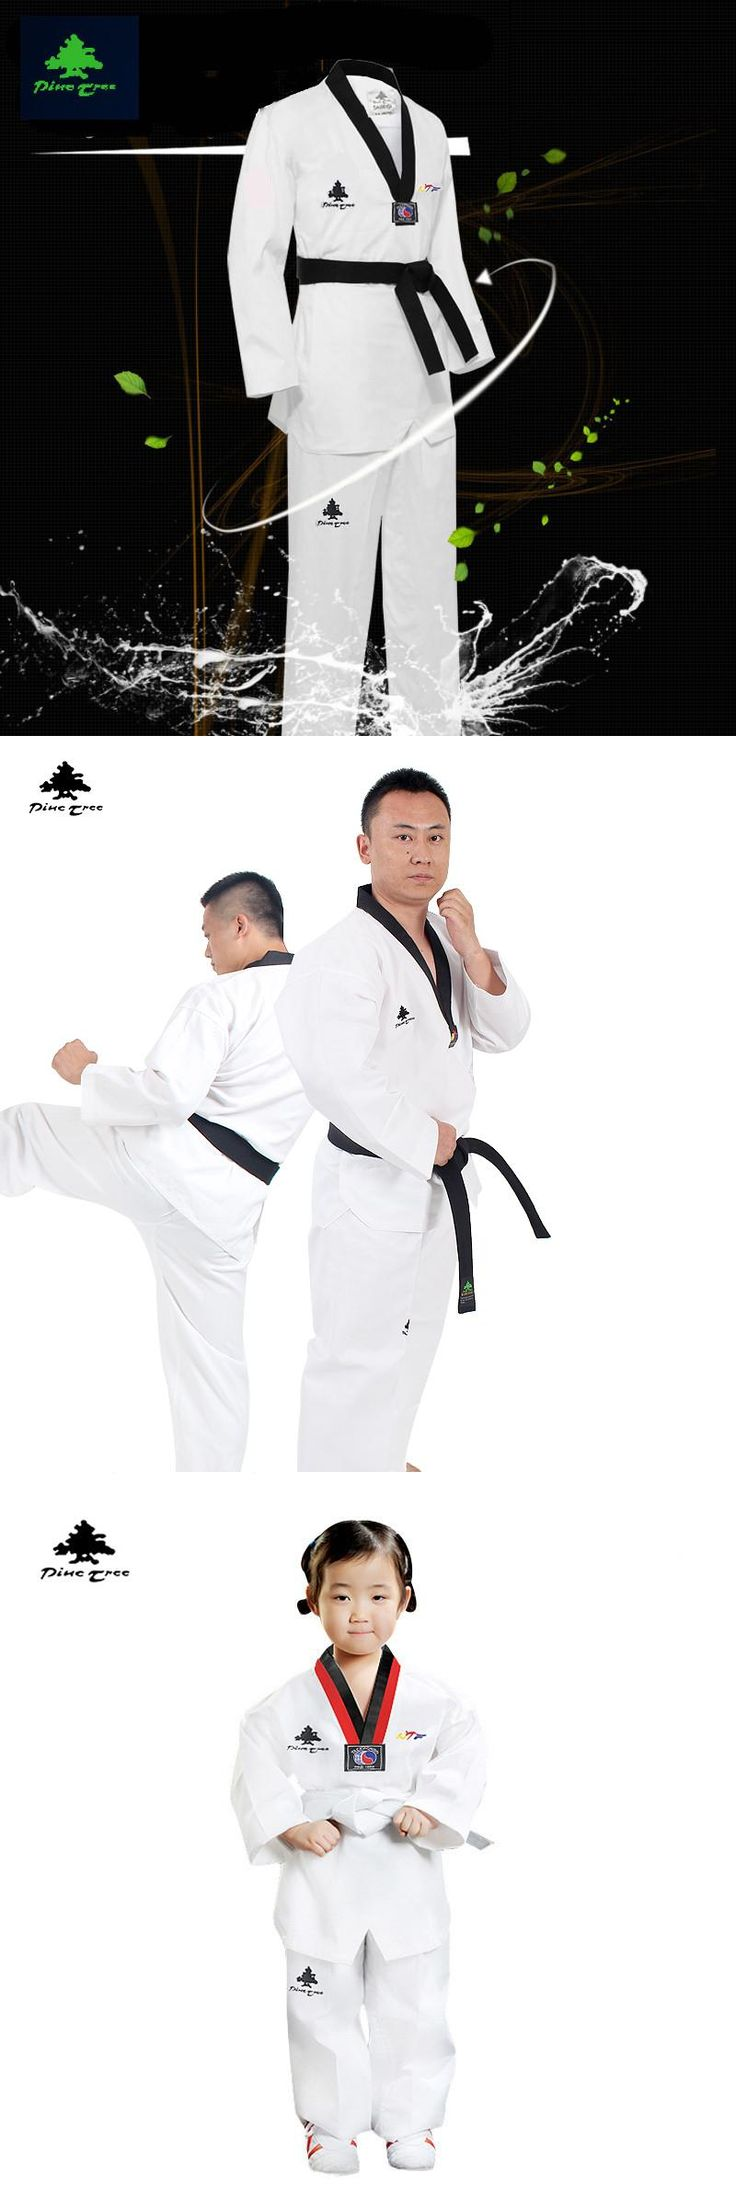 [Visit to Buy] MOOTO WTF Dobok Taekwondo Uniform Kukkiwon Korea Taekwondo Dobok with Special Fabric cooton black -v neck #Advertisement